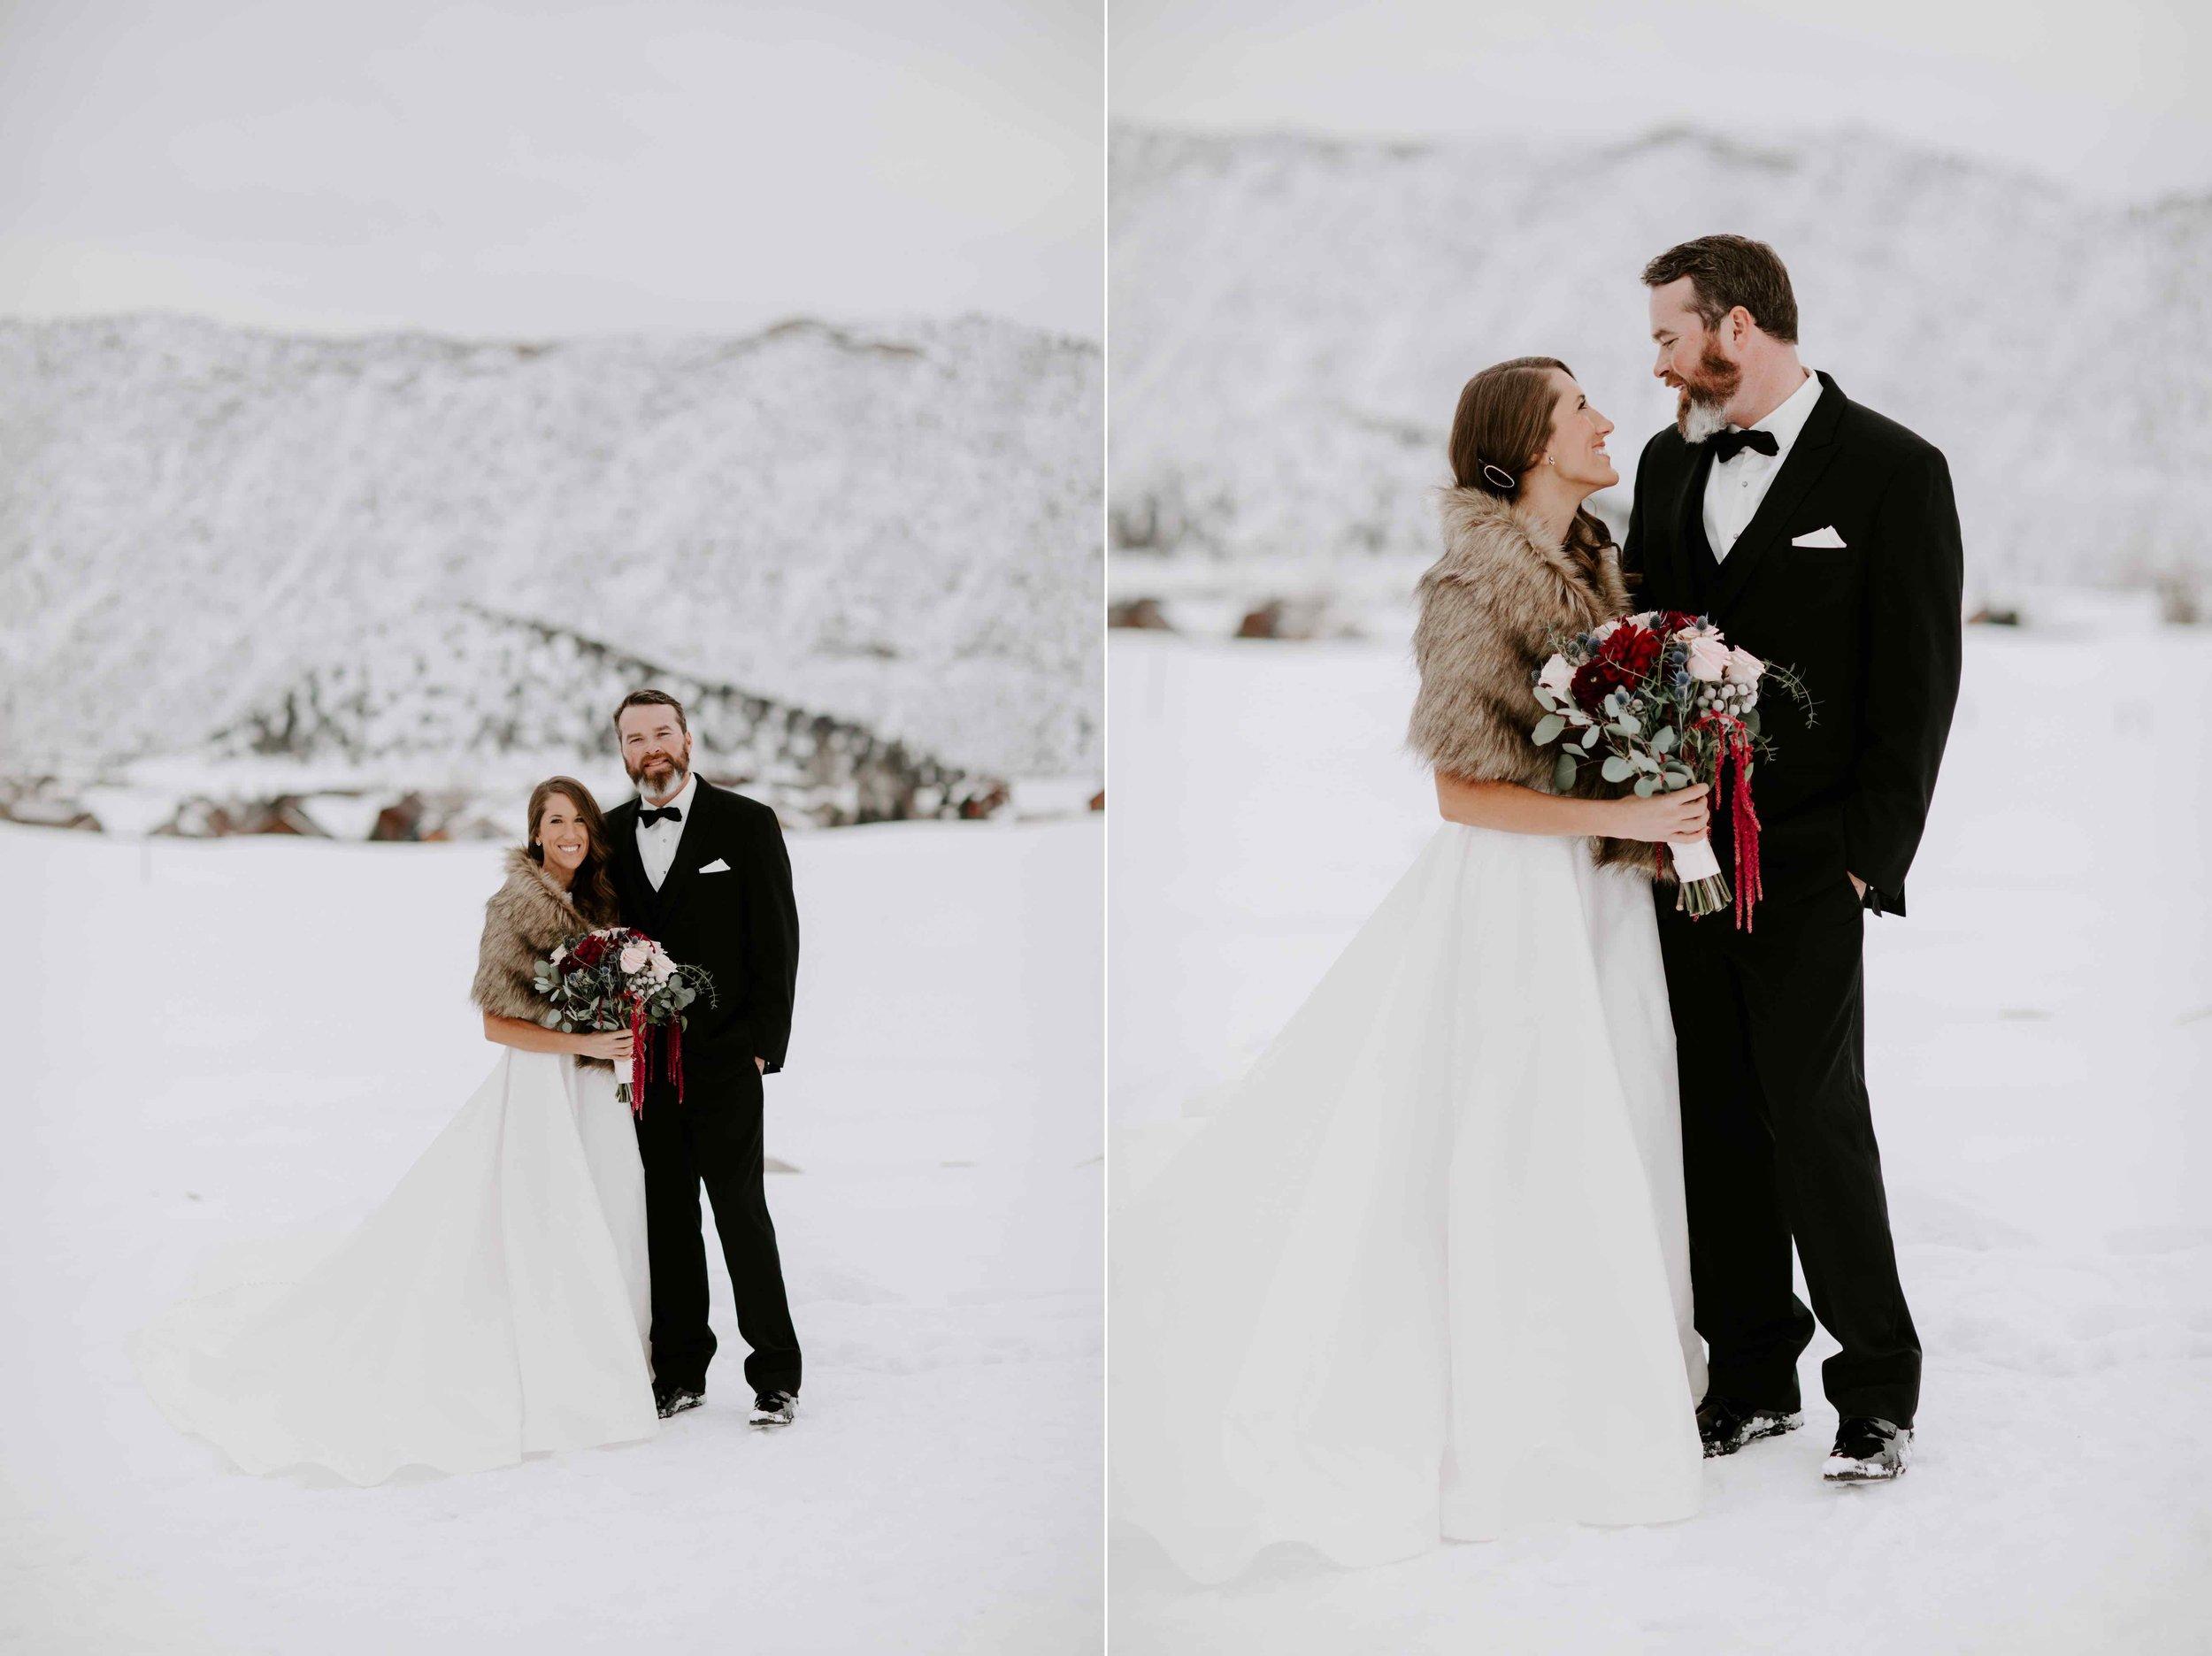 Kisa Conrad Favorites-0030-colorado-wedding-photographer-denver-springs-vailhotel-glenwood-springs-colorado-wedding-photographer.jpeg